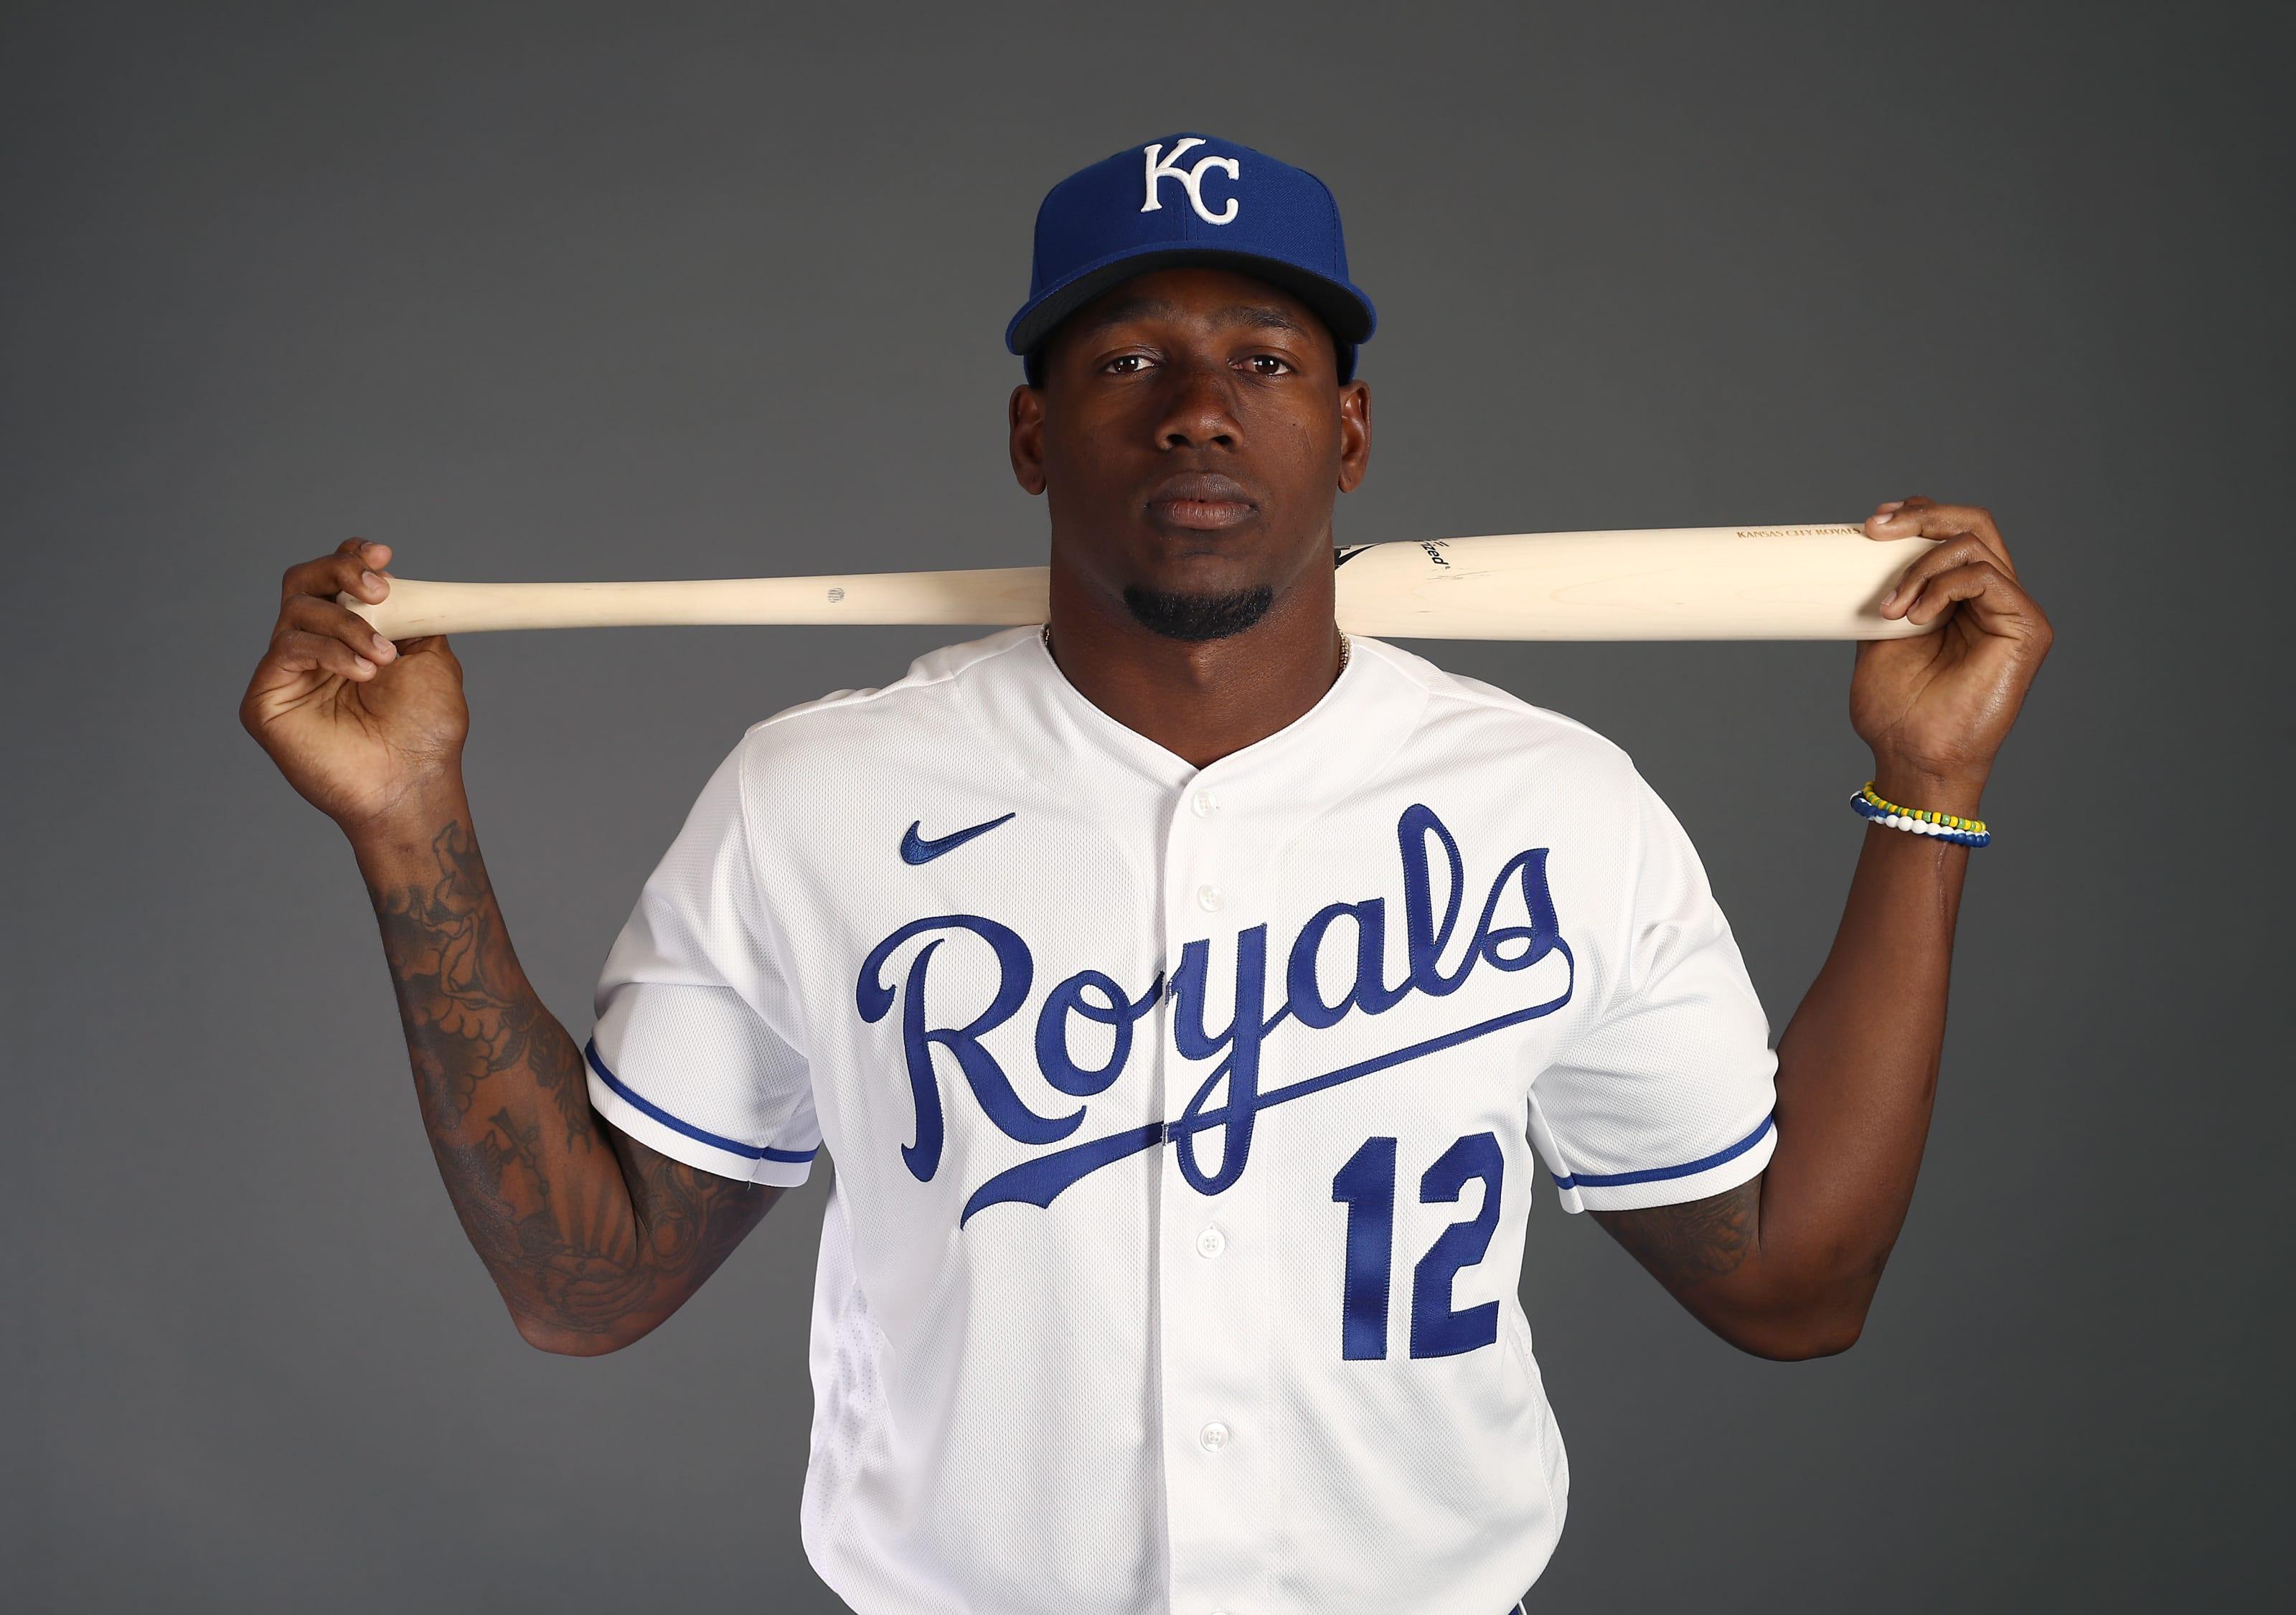 Kansas City Royals, Jorge Soler